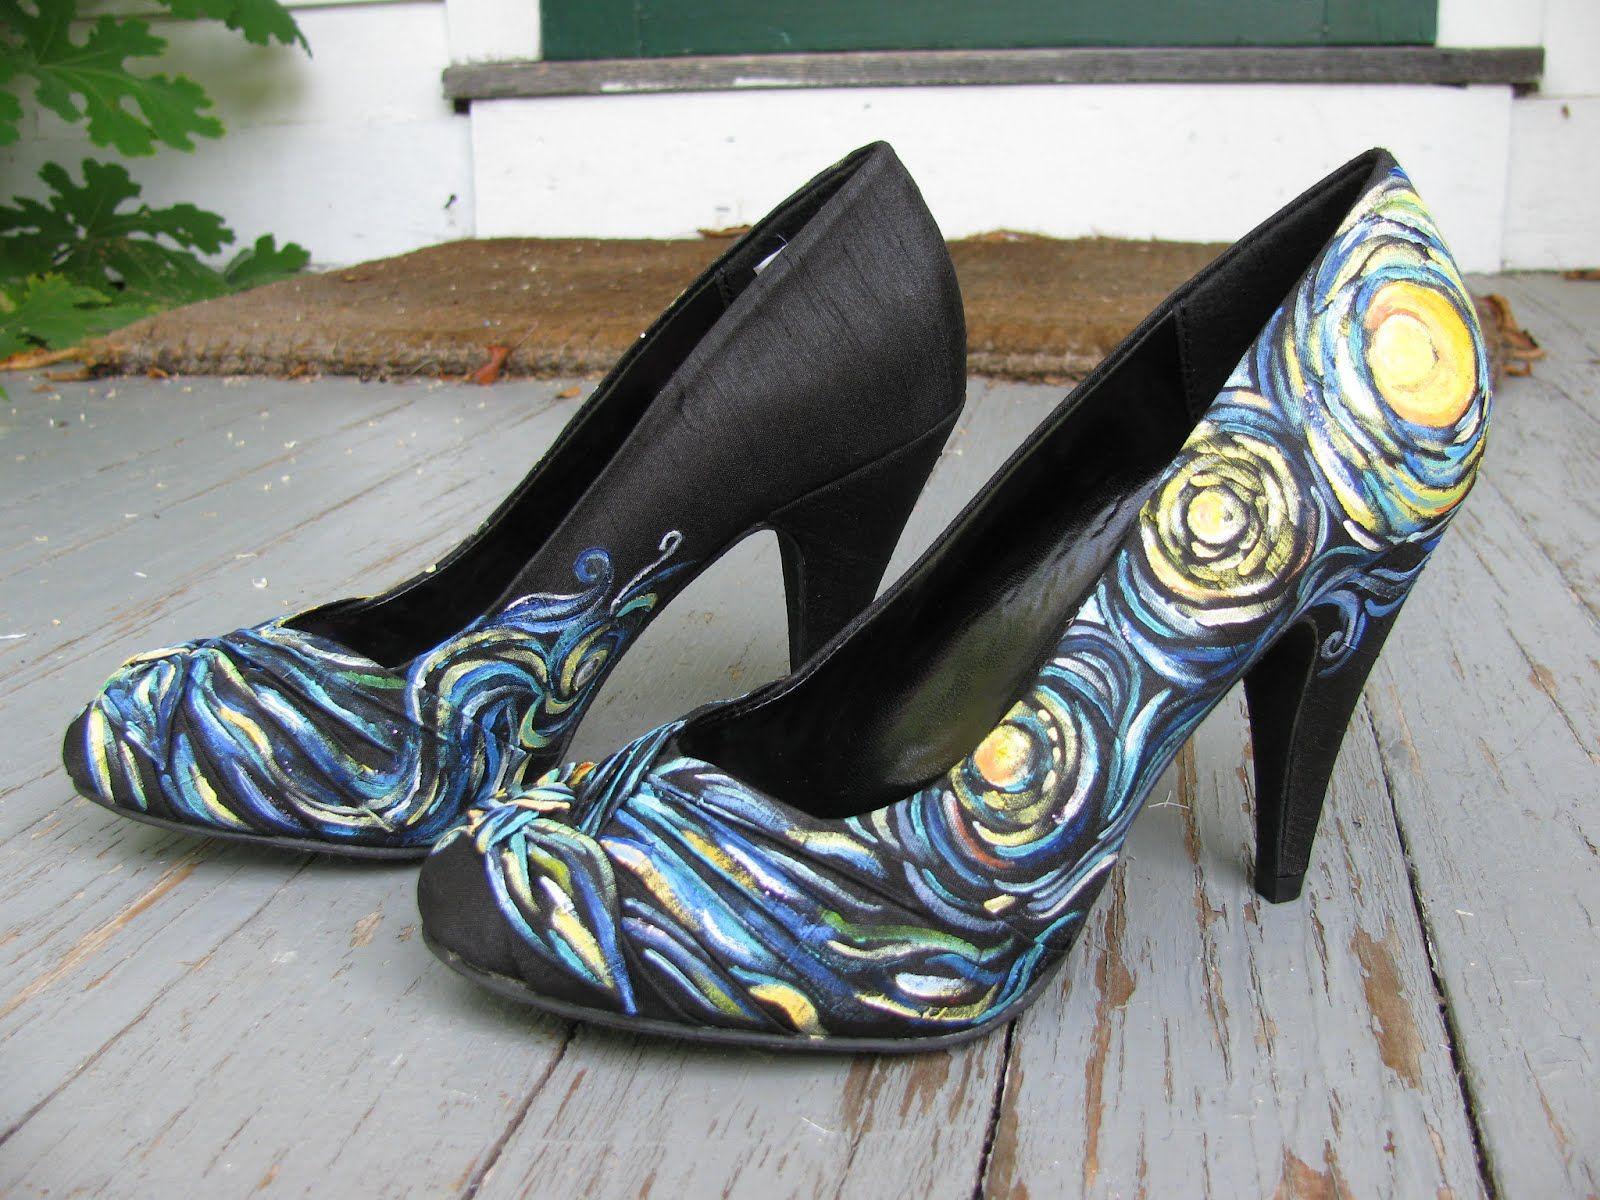 Painting plain black high heels.